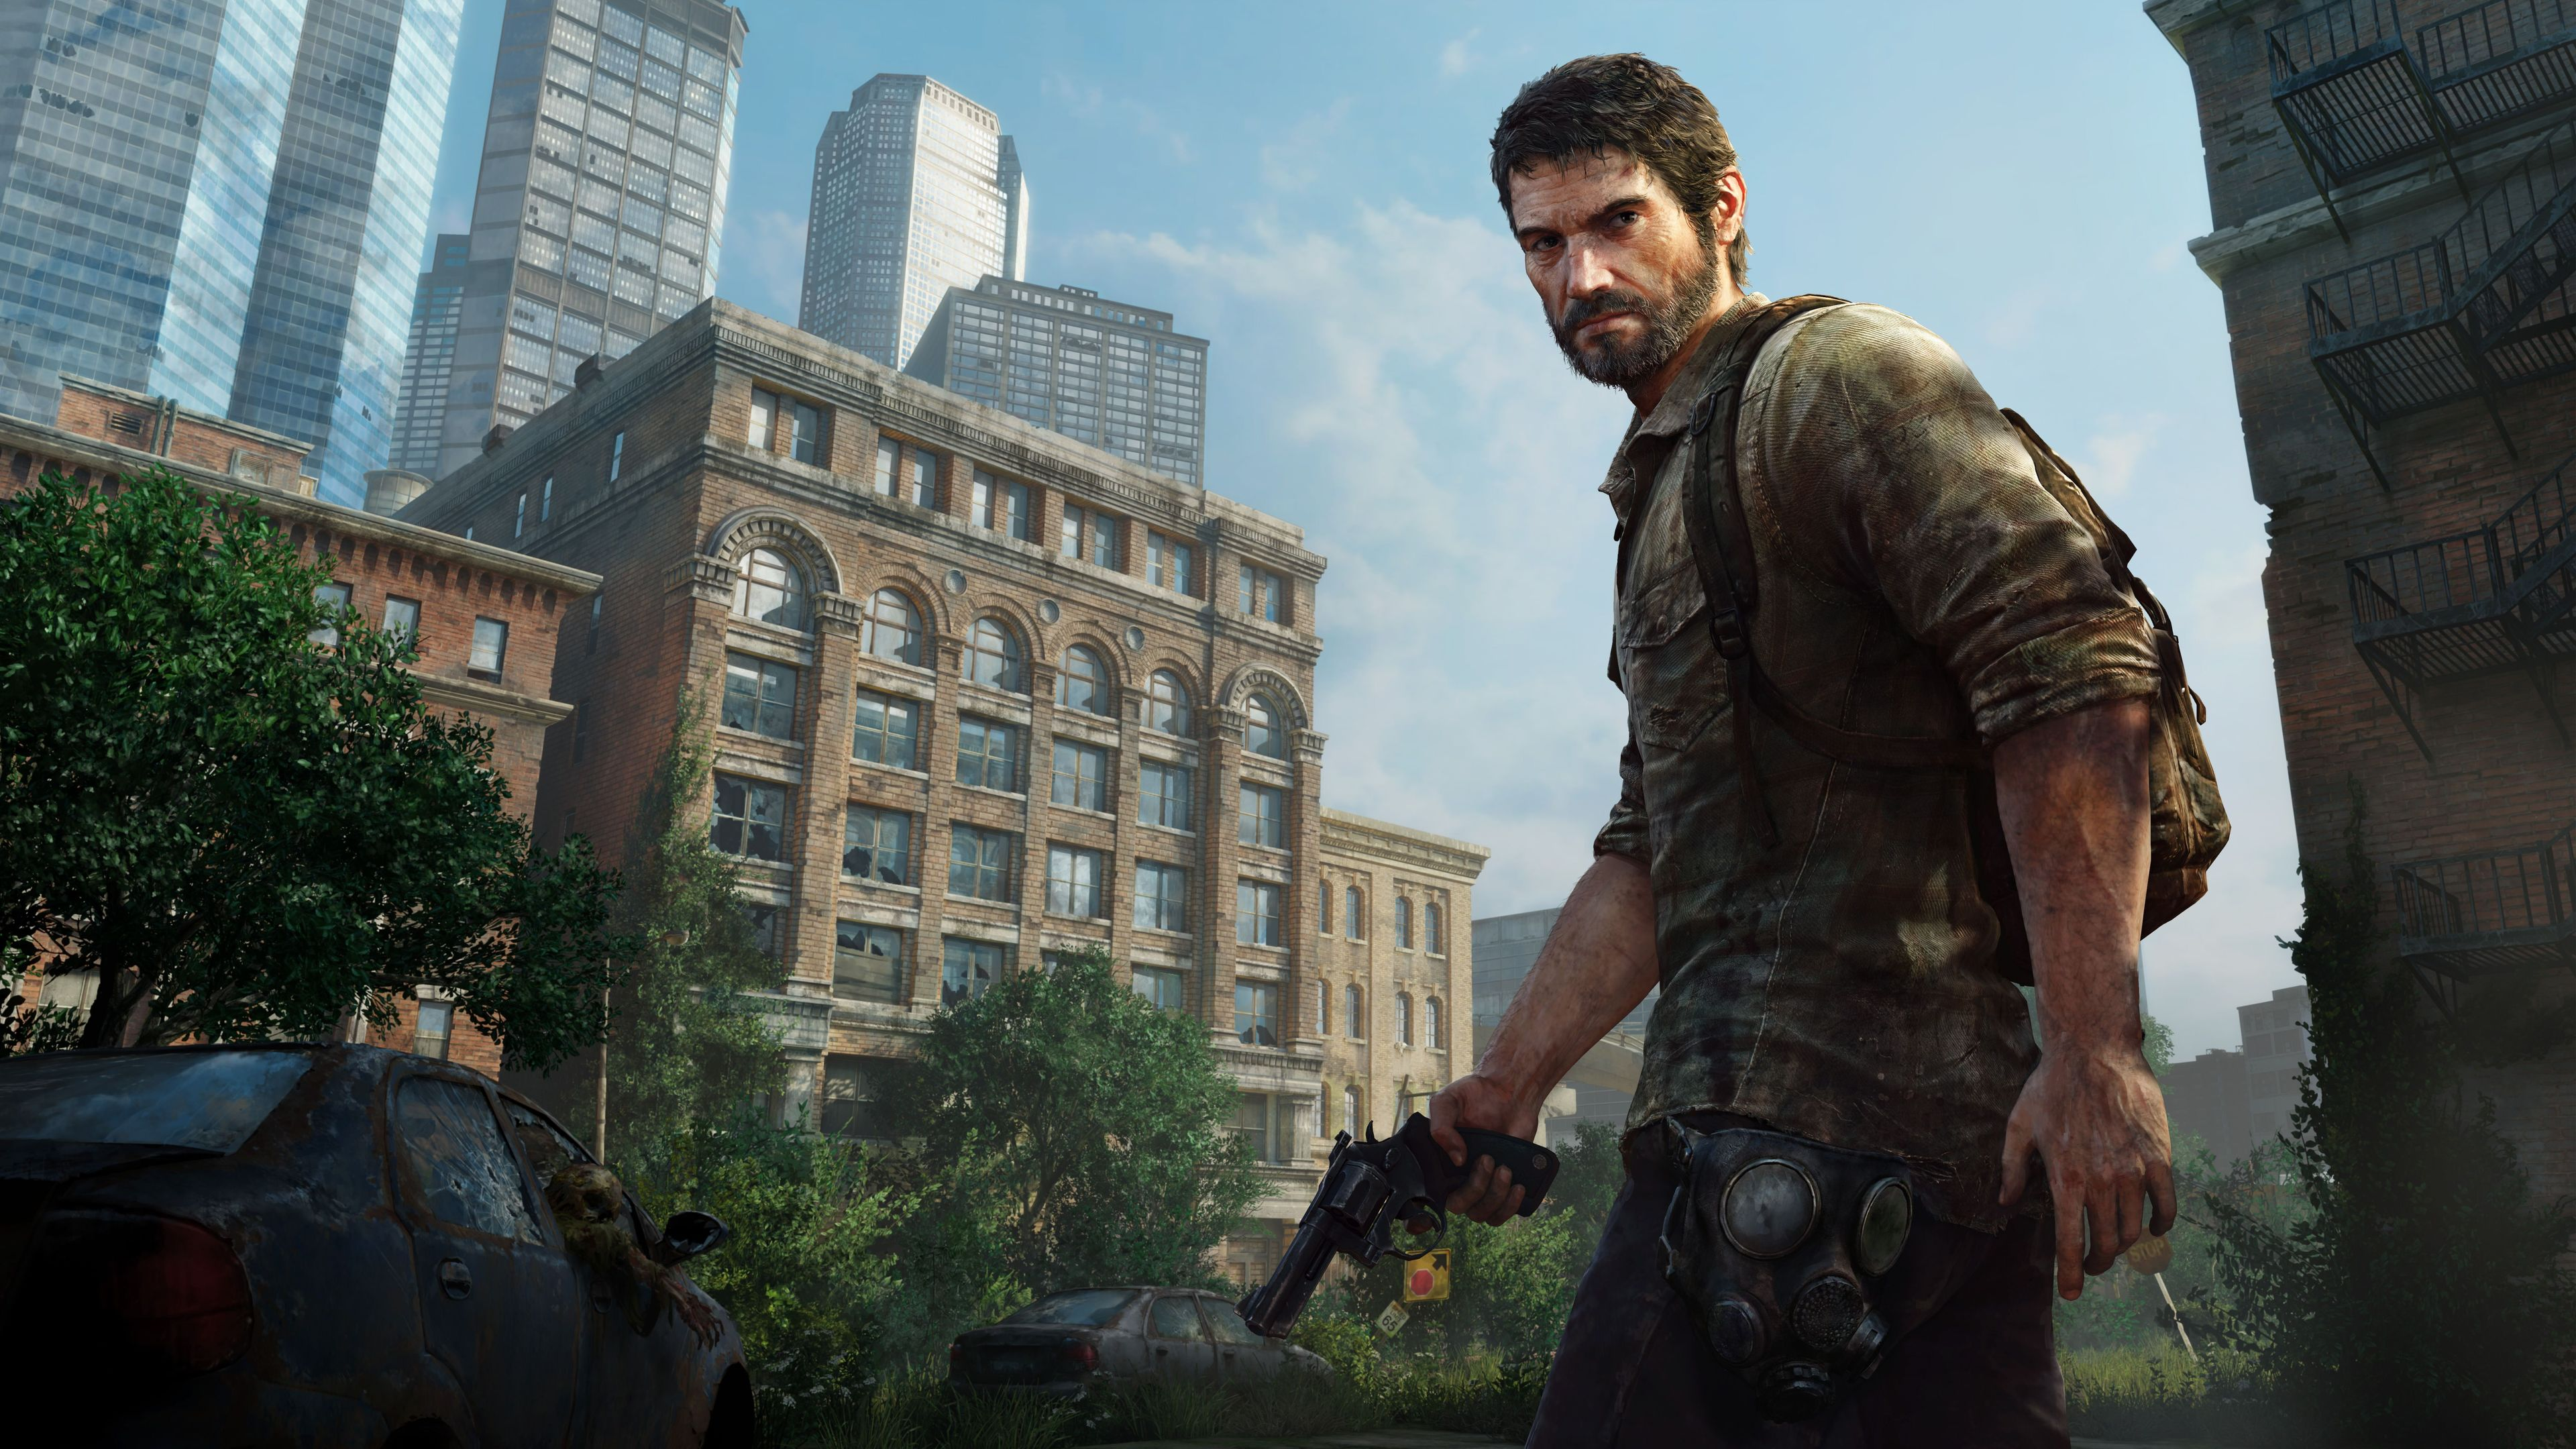 Wallpaper 4k The Last Of Us 4k 2019 Games Wallpapers 4k